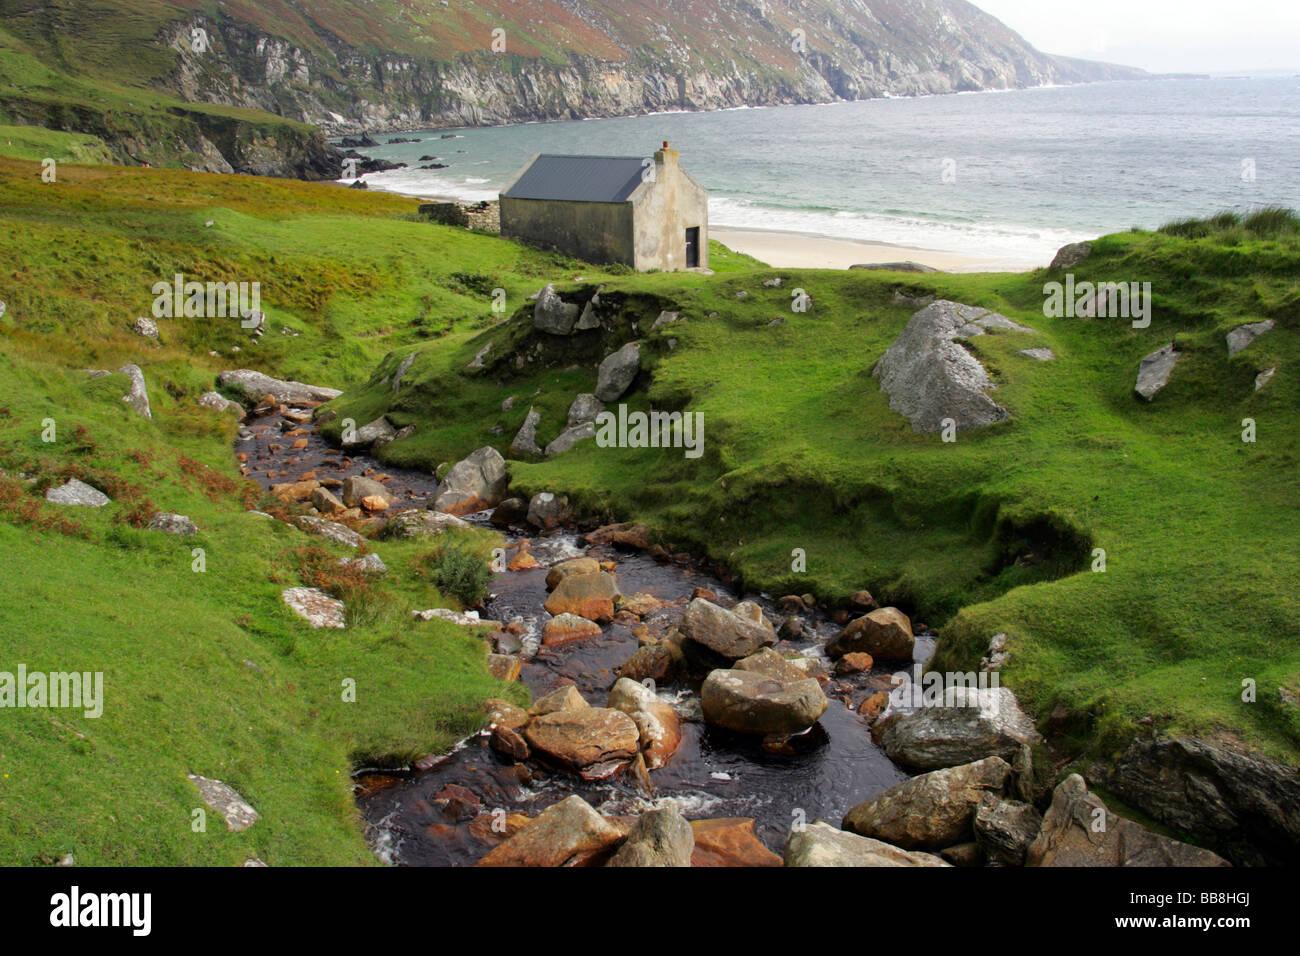 Coastal Cottages Com Stone Cottage On Coast Near Keel